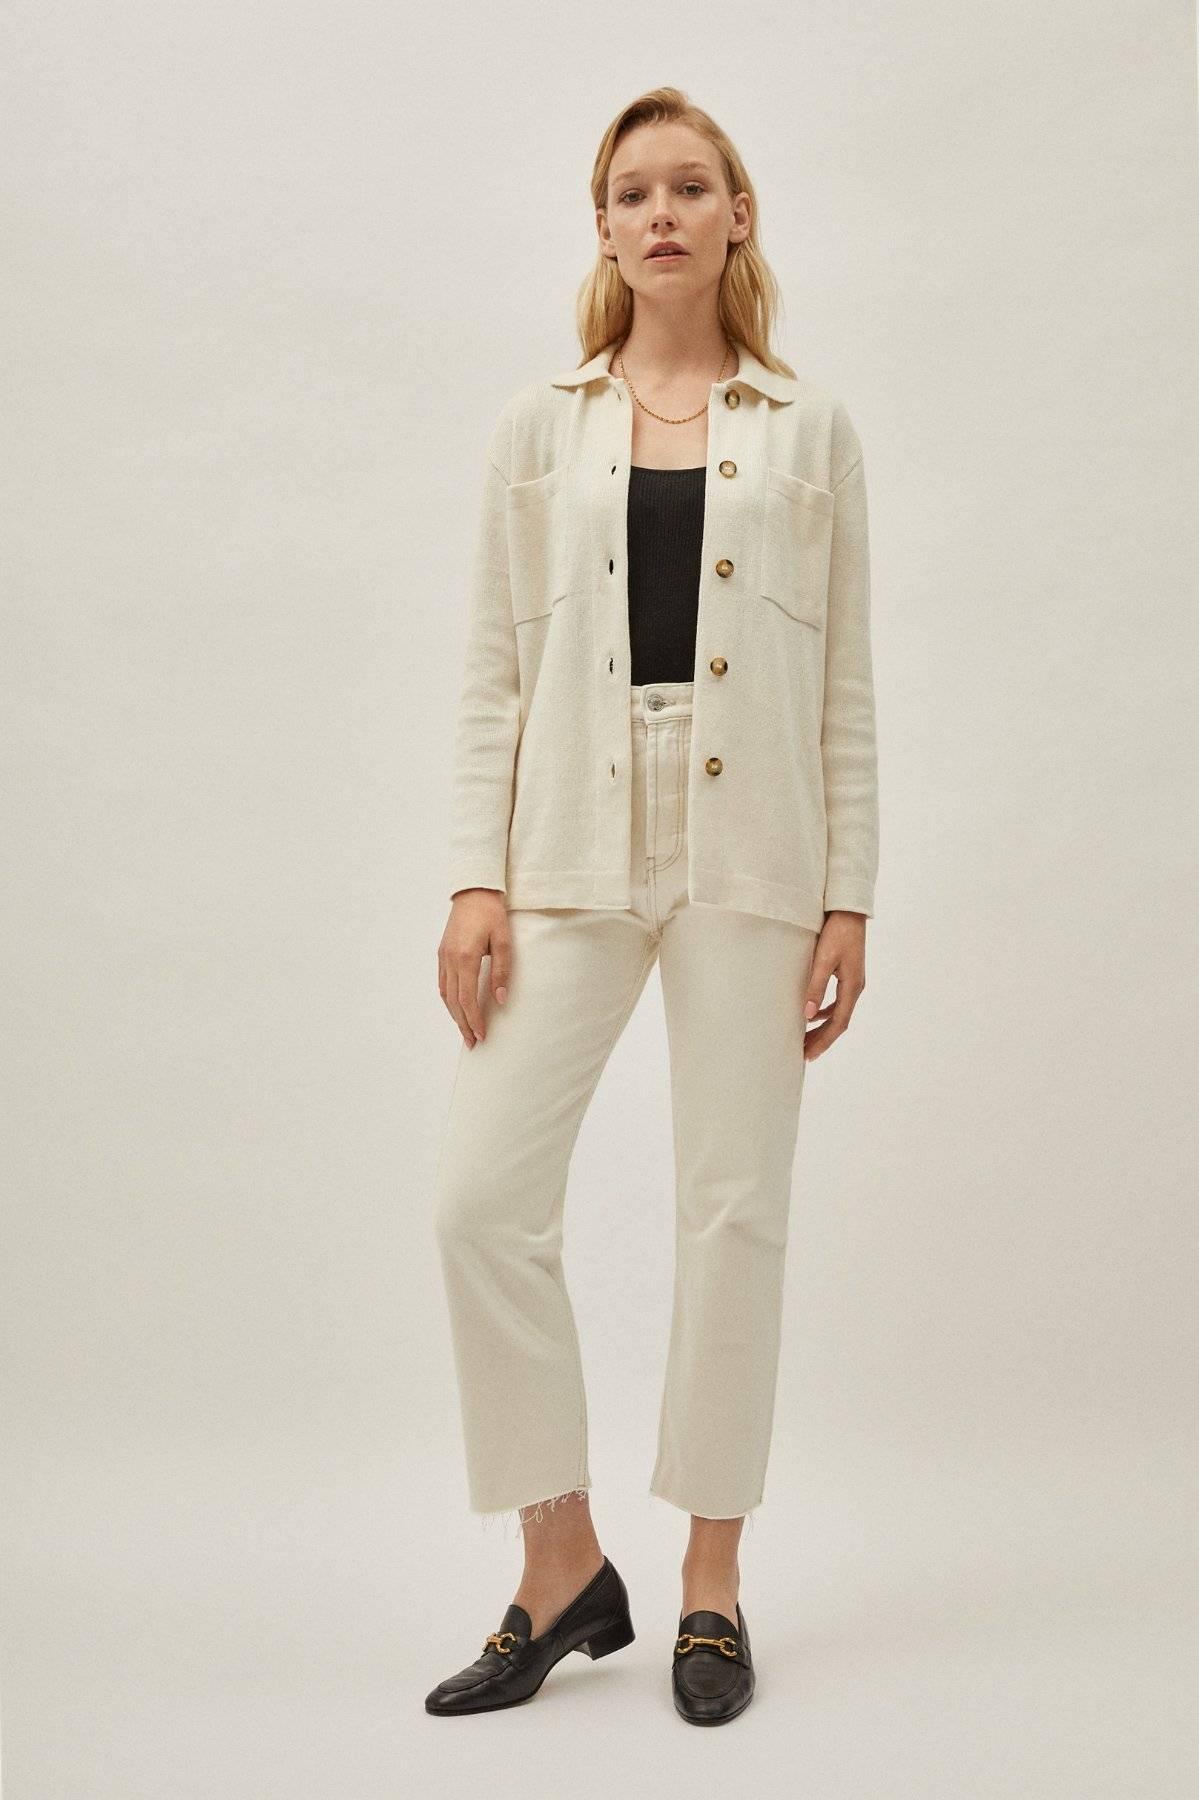 The Linen Cotton Overshirt - Ivory